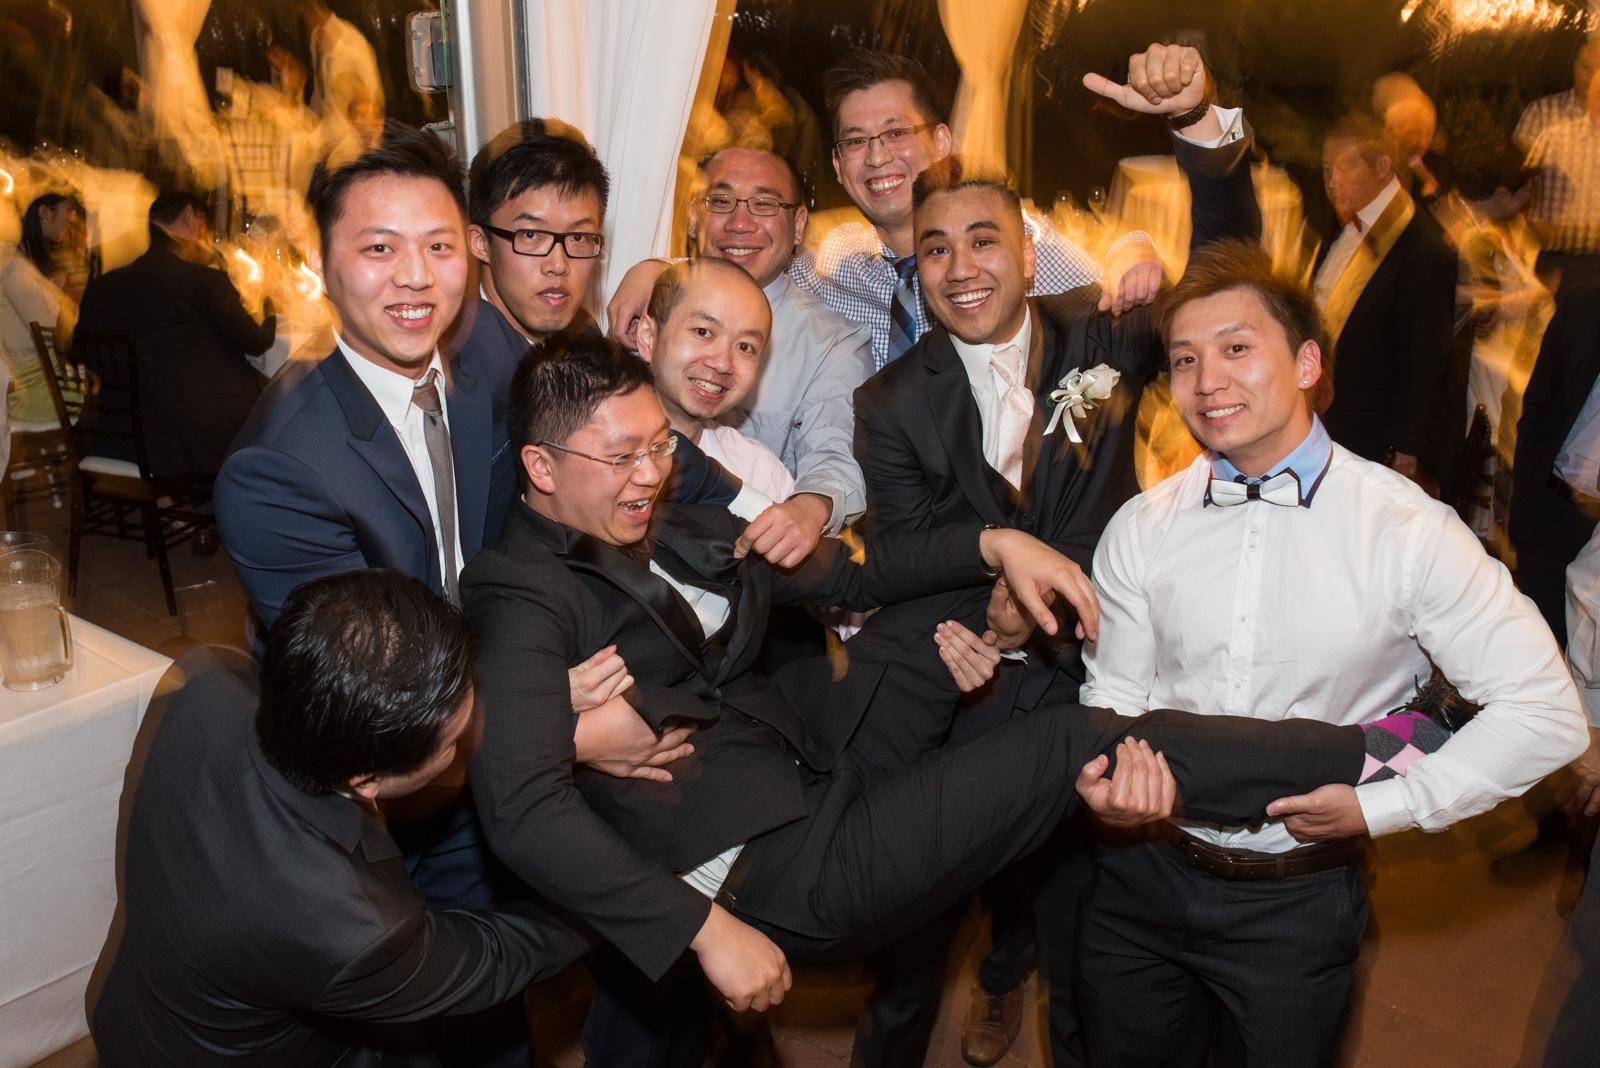 vancouver-island-wedding-photographers--brock-house-restaurant-wedding-51.jpg